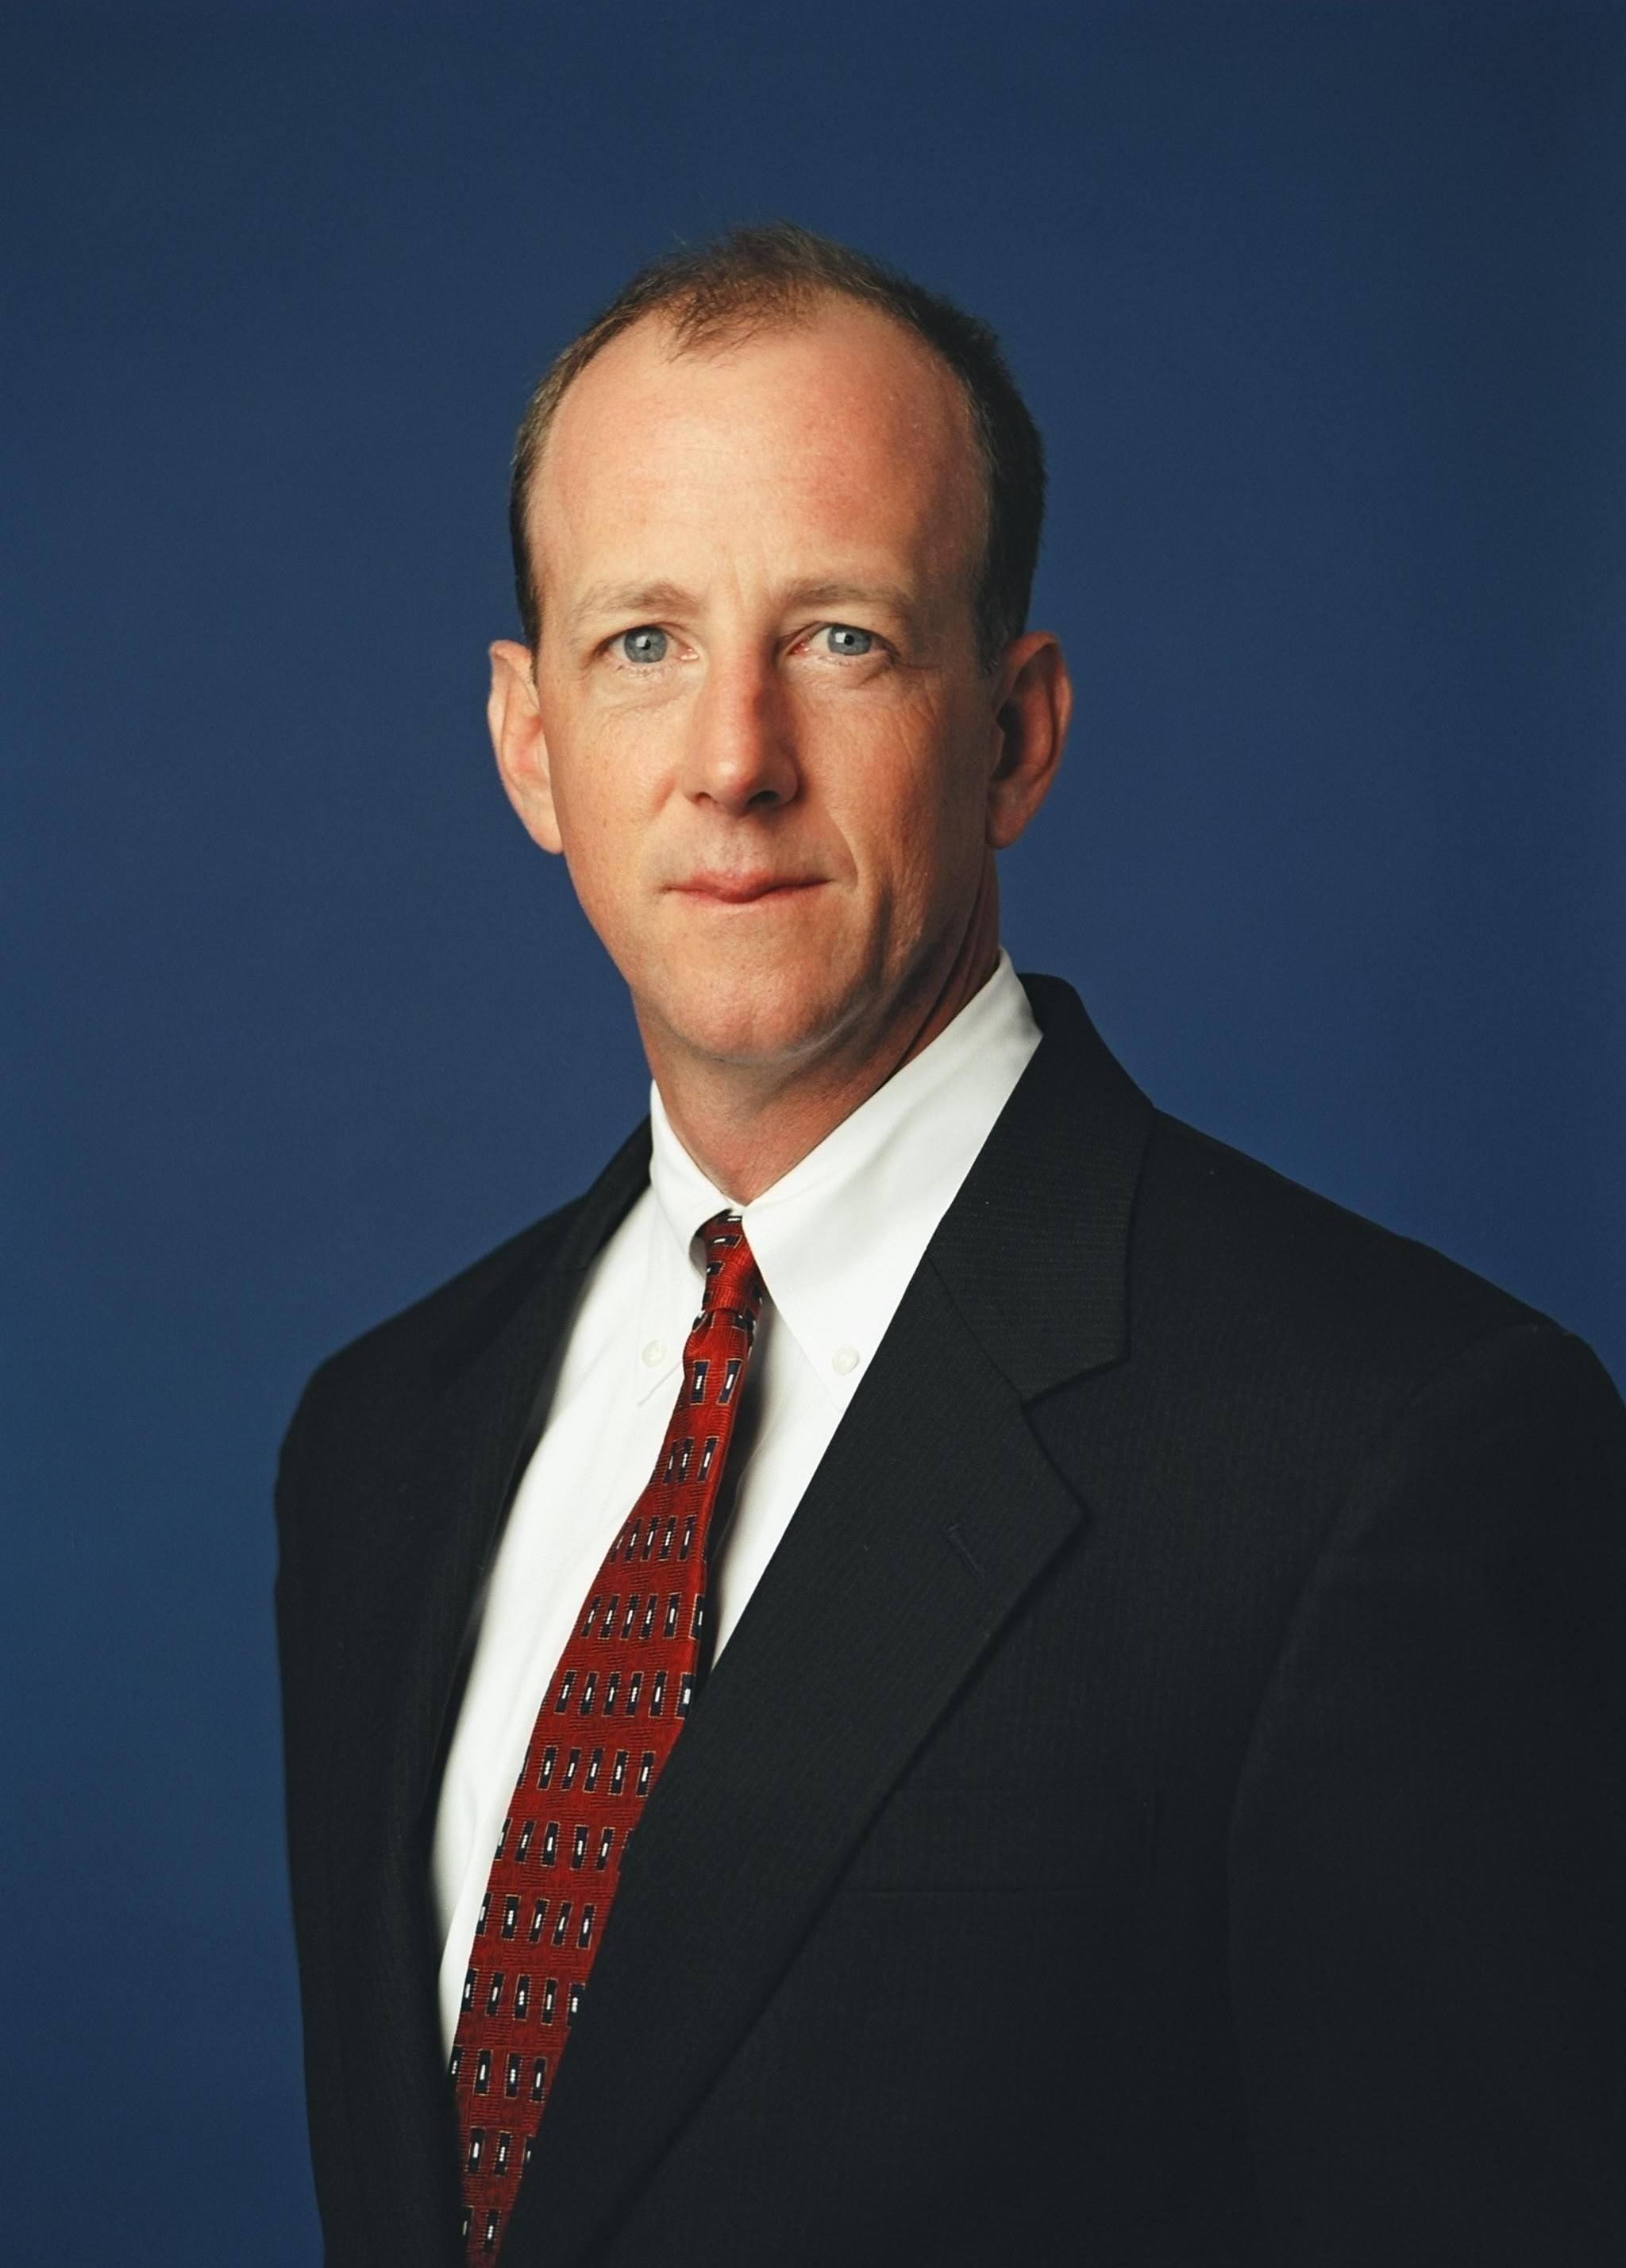 Image of John D. McGavin